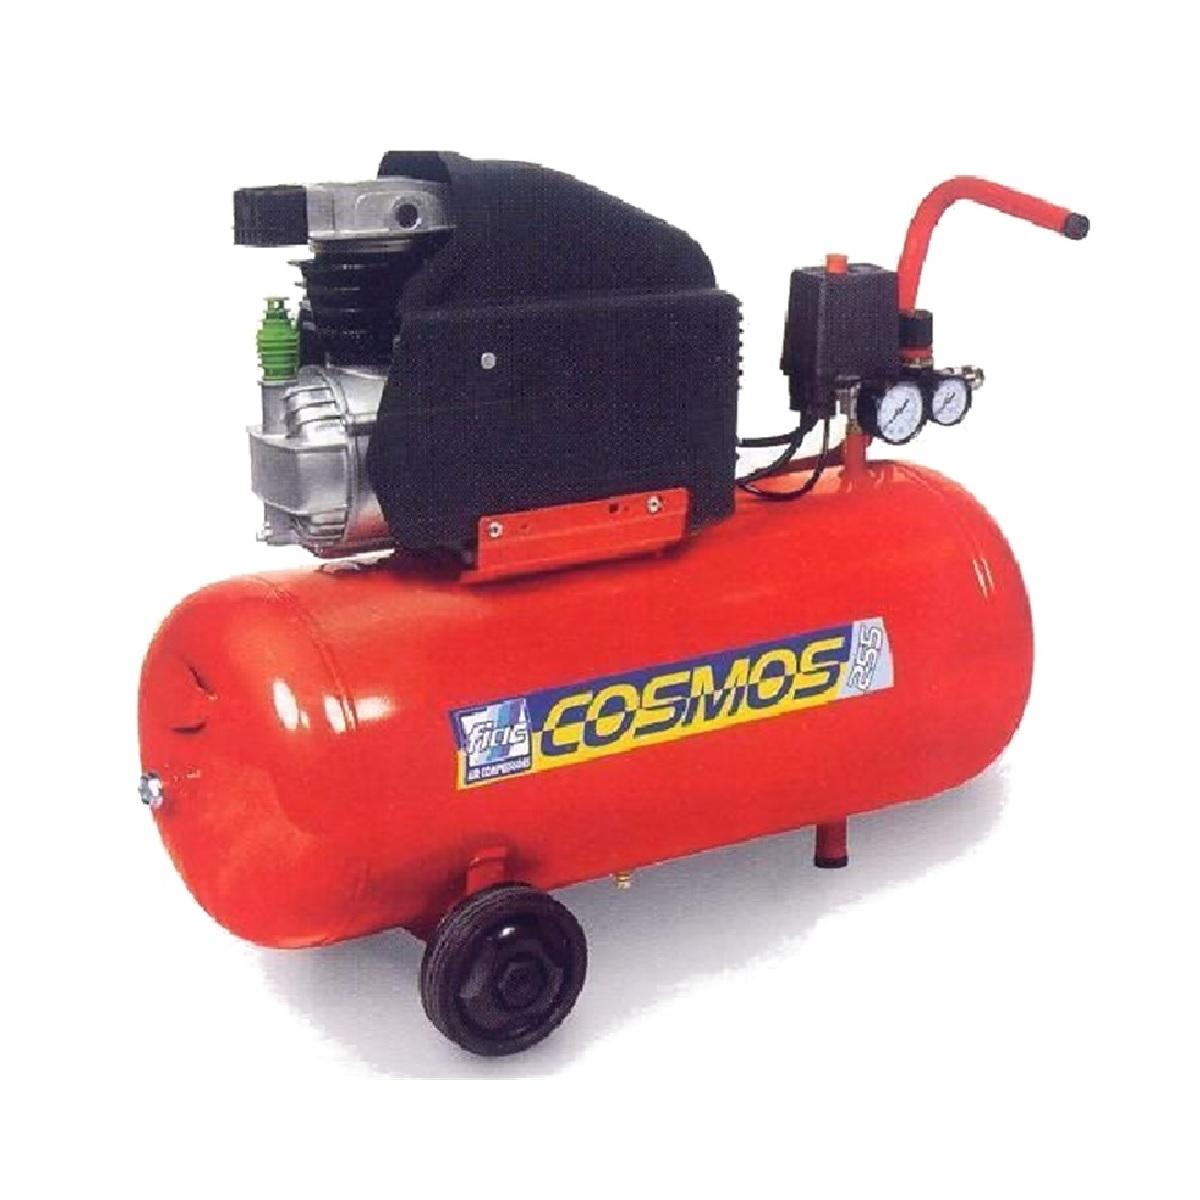 Fiac AB 24/193 Air Compressor 2.5HP 24L (Made In Italy)